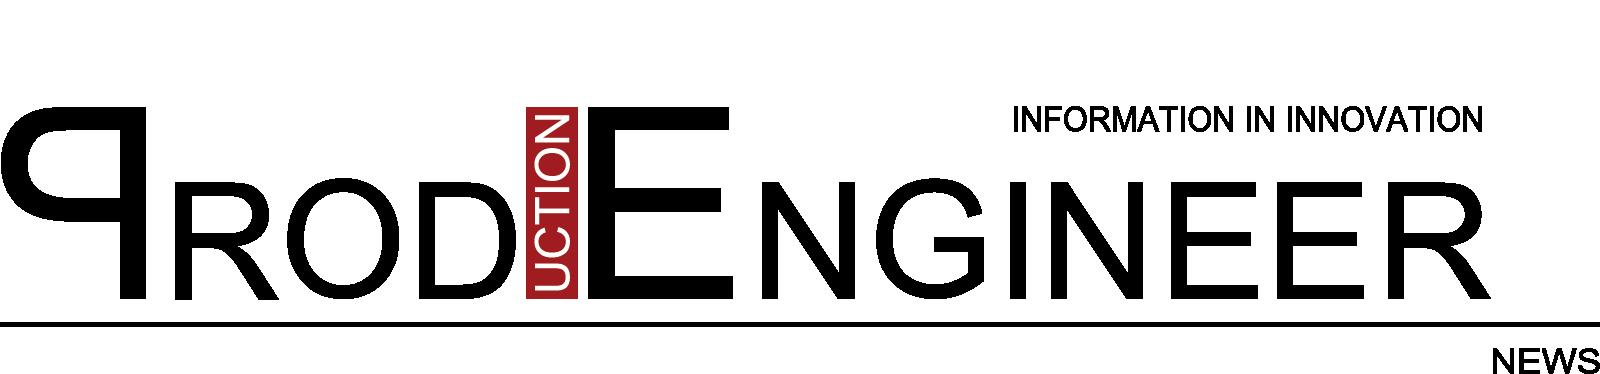 ProdEngineer